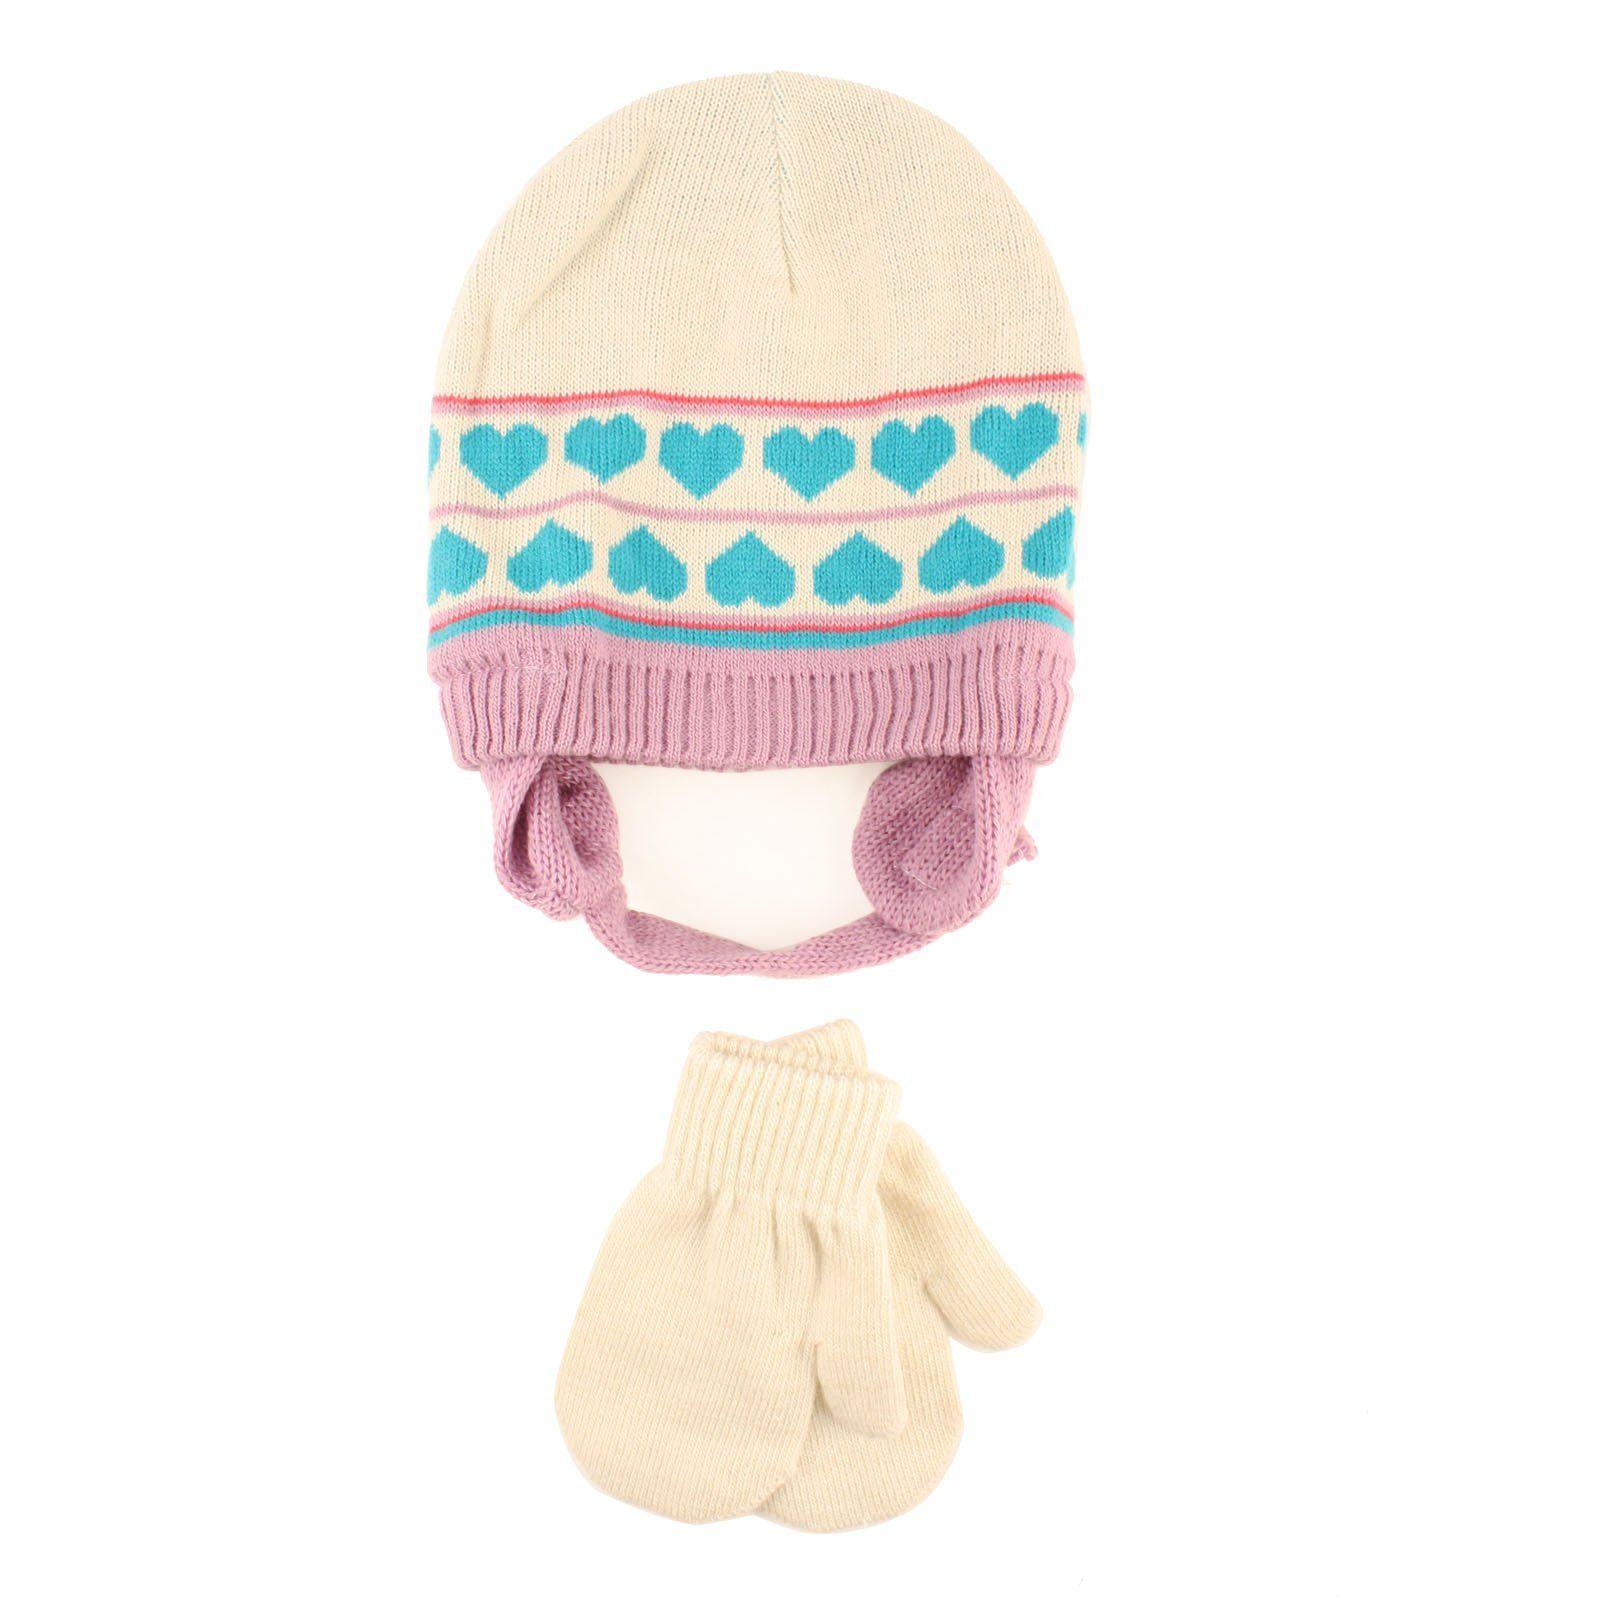 8565eb7b8ad Winter 2pc Girls Age 0-2 Baby Knit Beanie Earflap Hat Mitten Gloves Set Gray